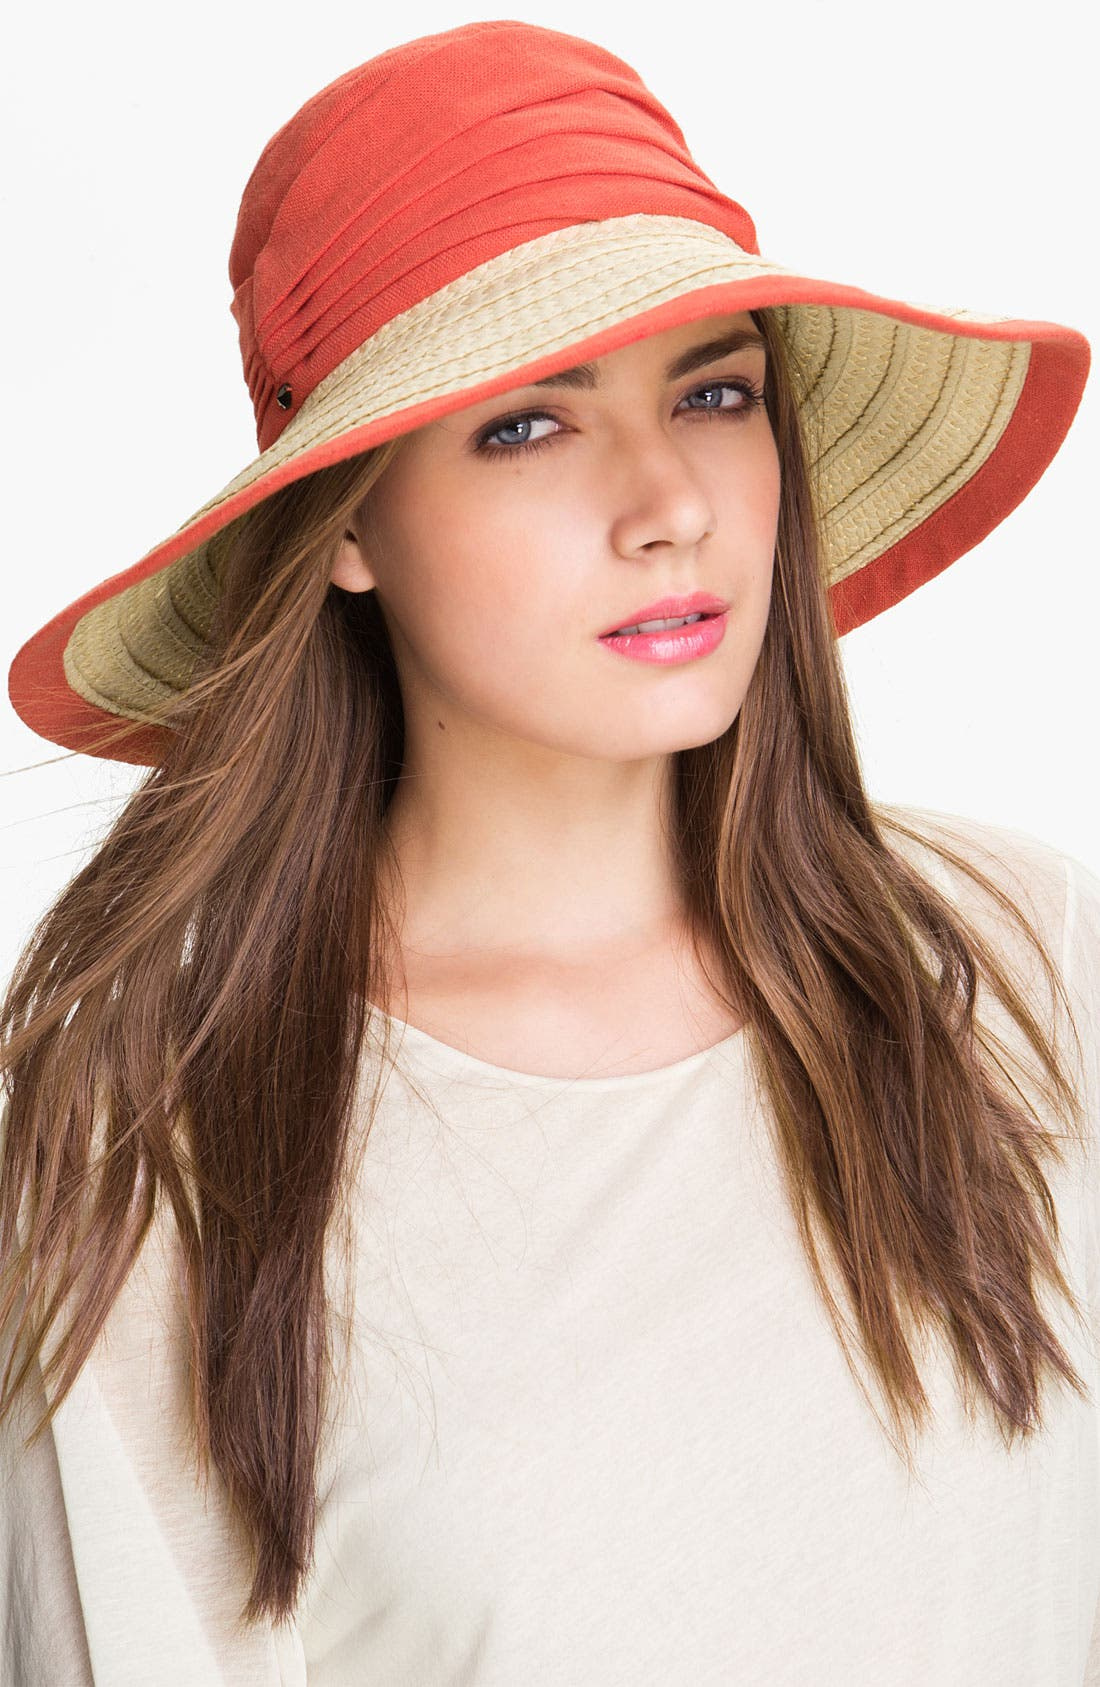 Alternate Image 1 Selected - Nordstrom Linen Crown Sun Hat